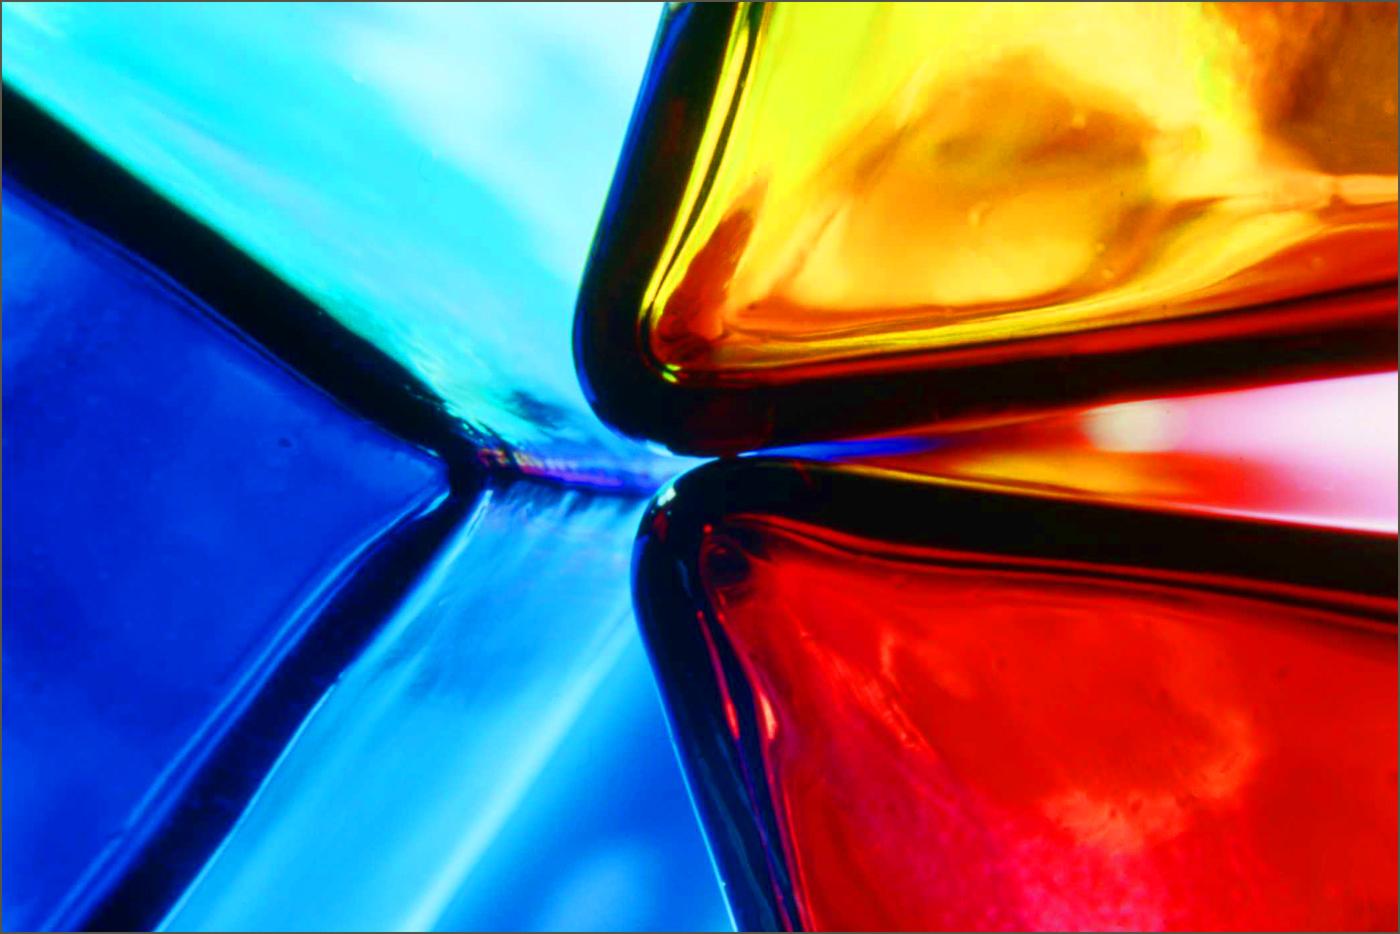 06 Glass Edges